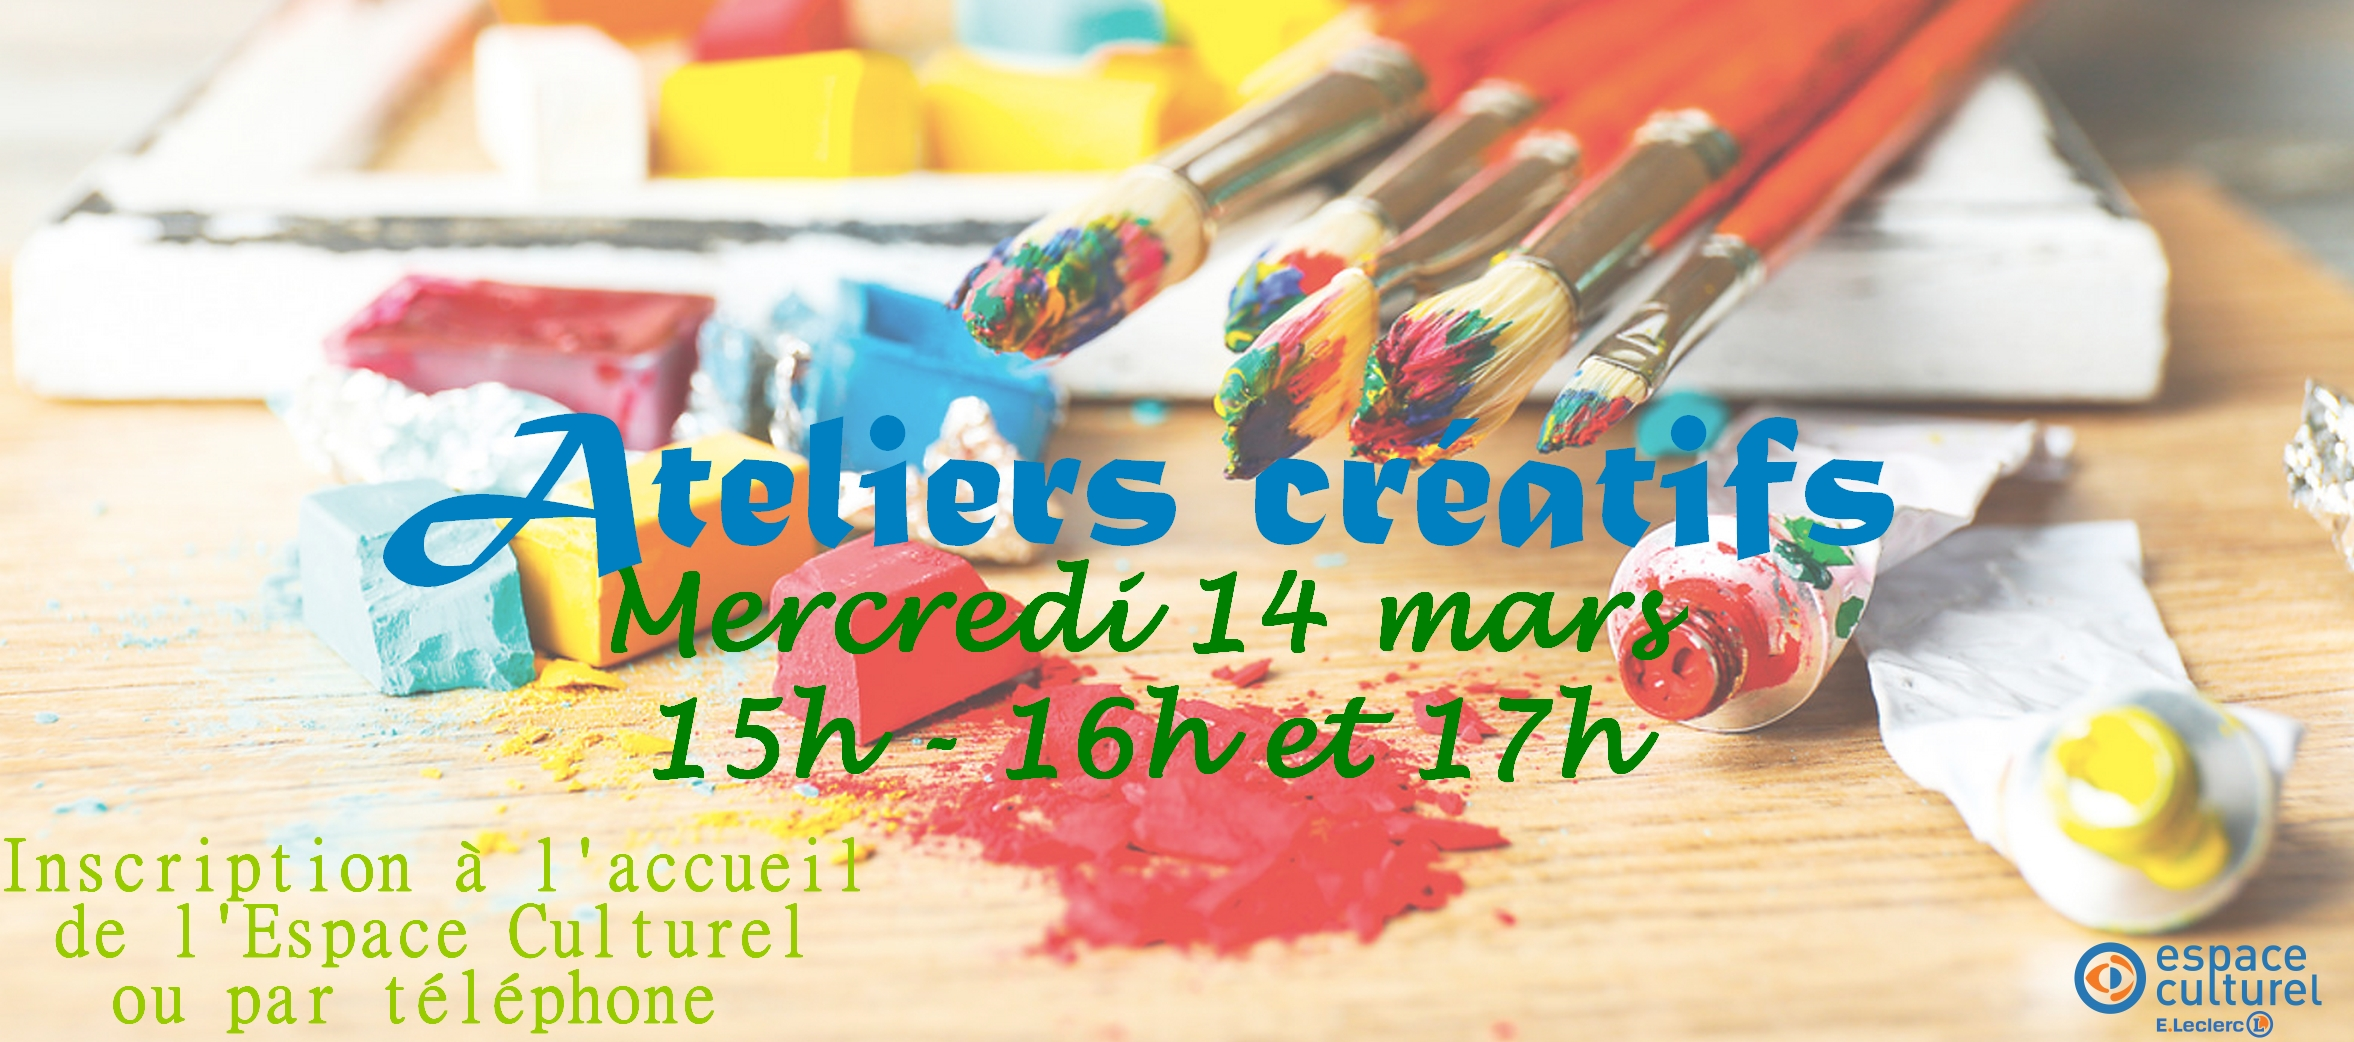 Ateliers+creatif+mars